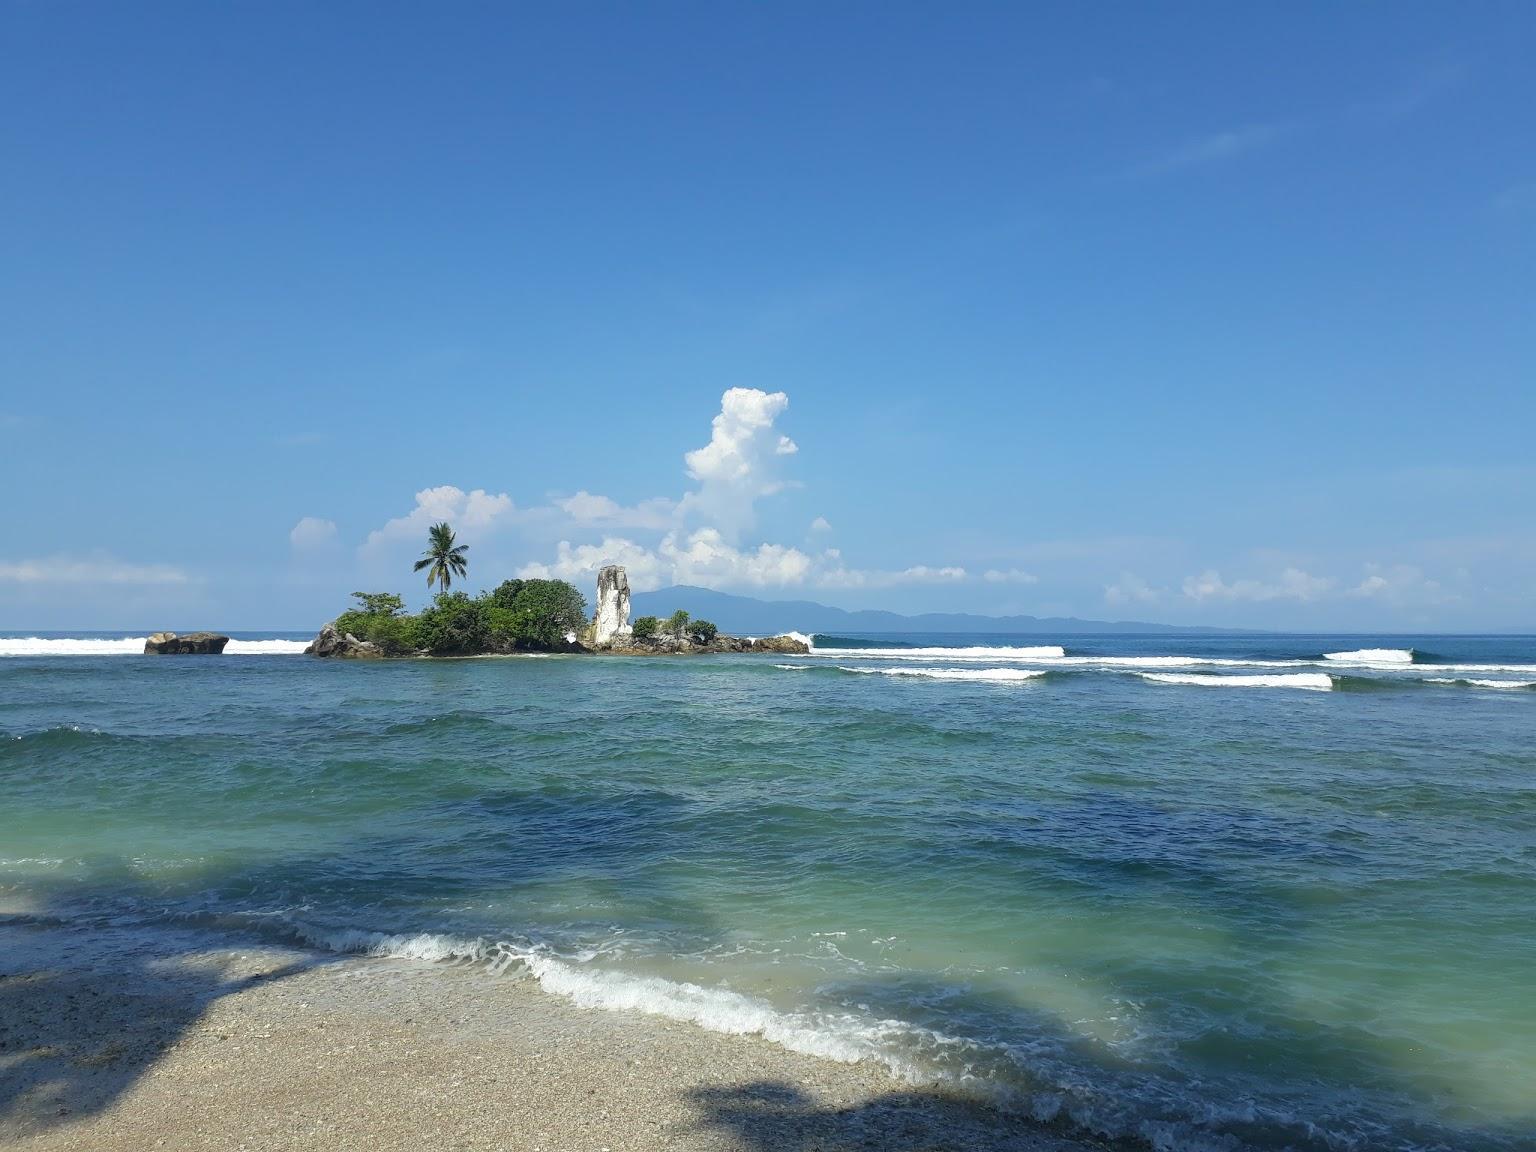 Karang Putih Cukuh Balak Beach